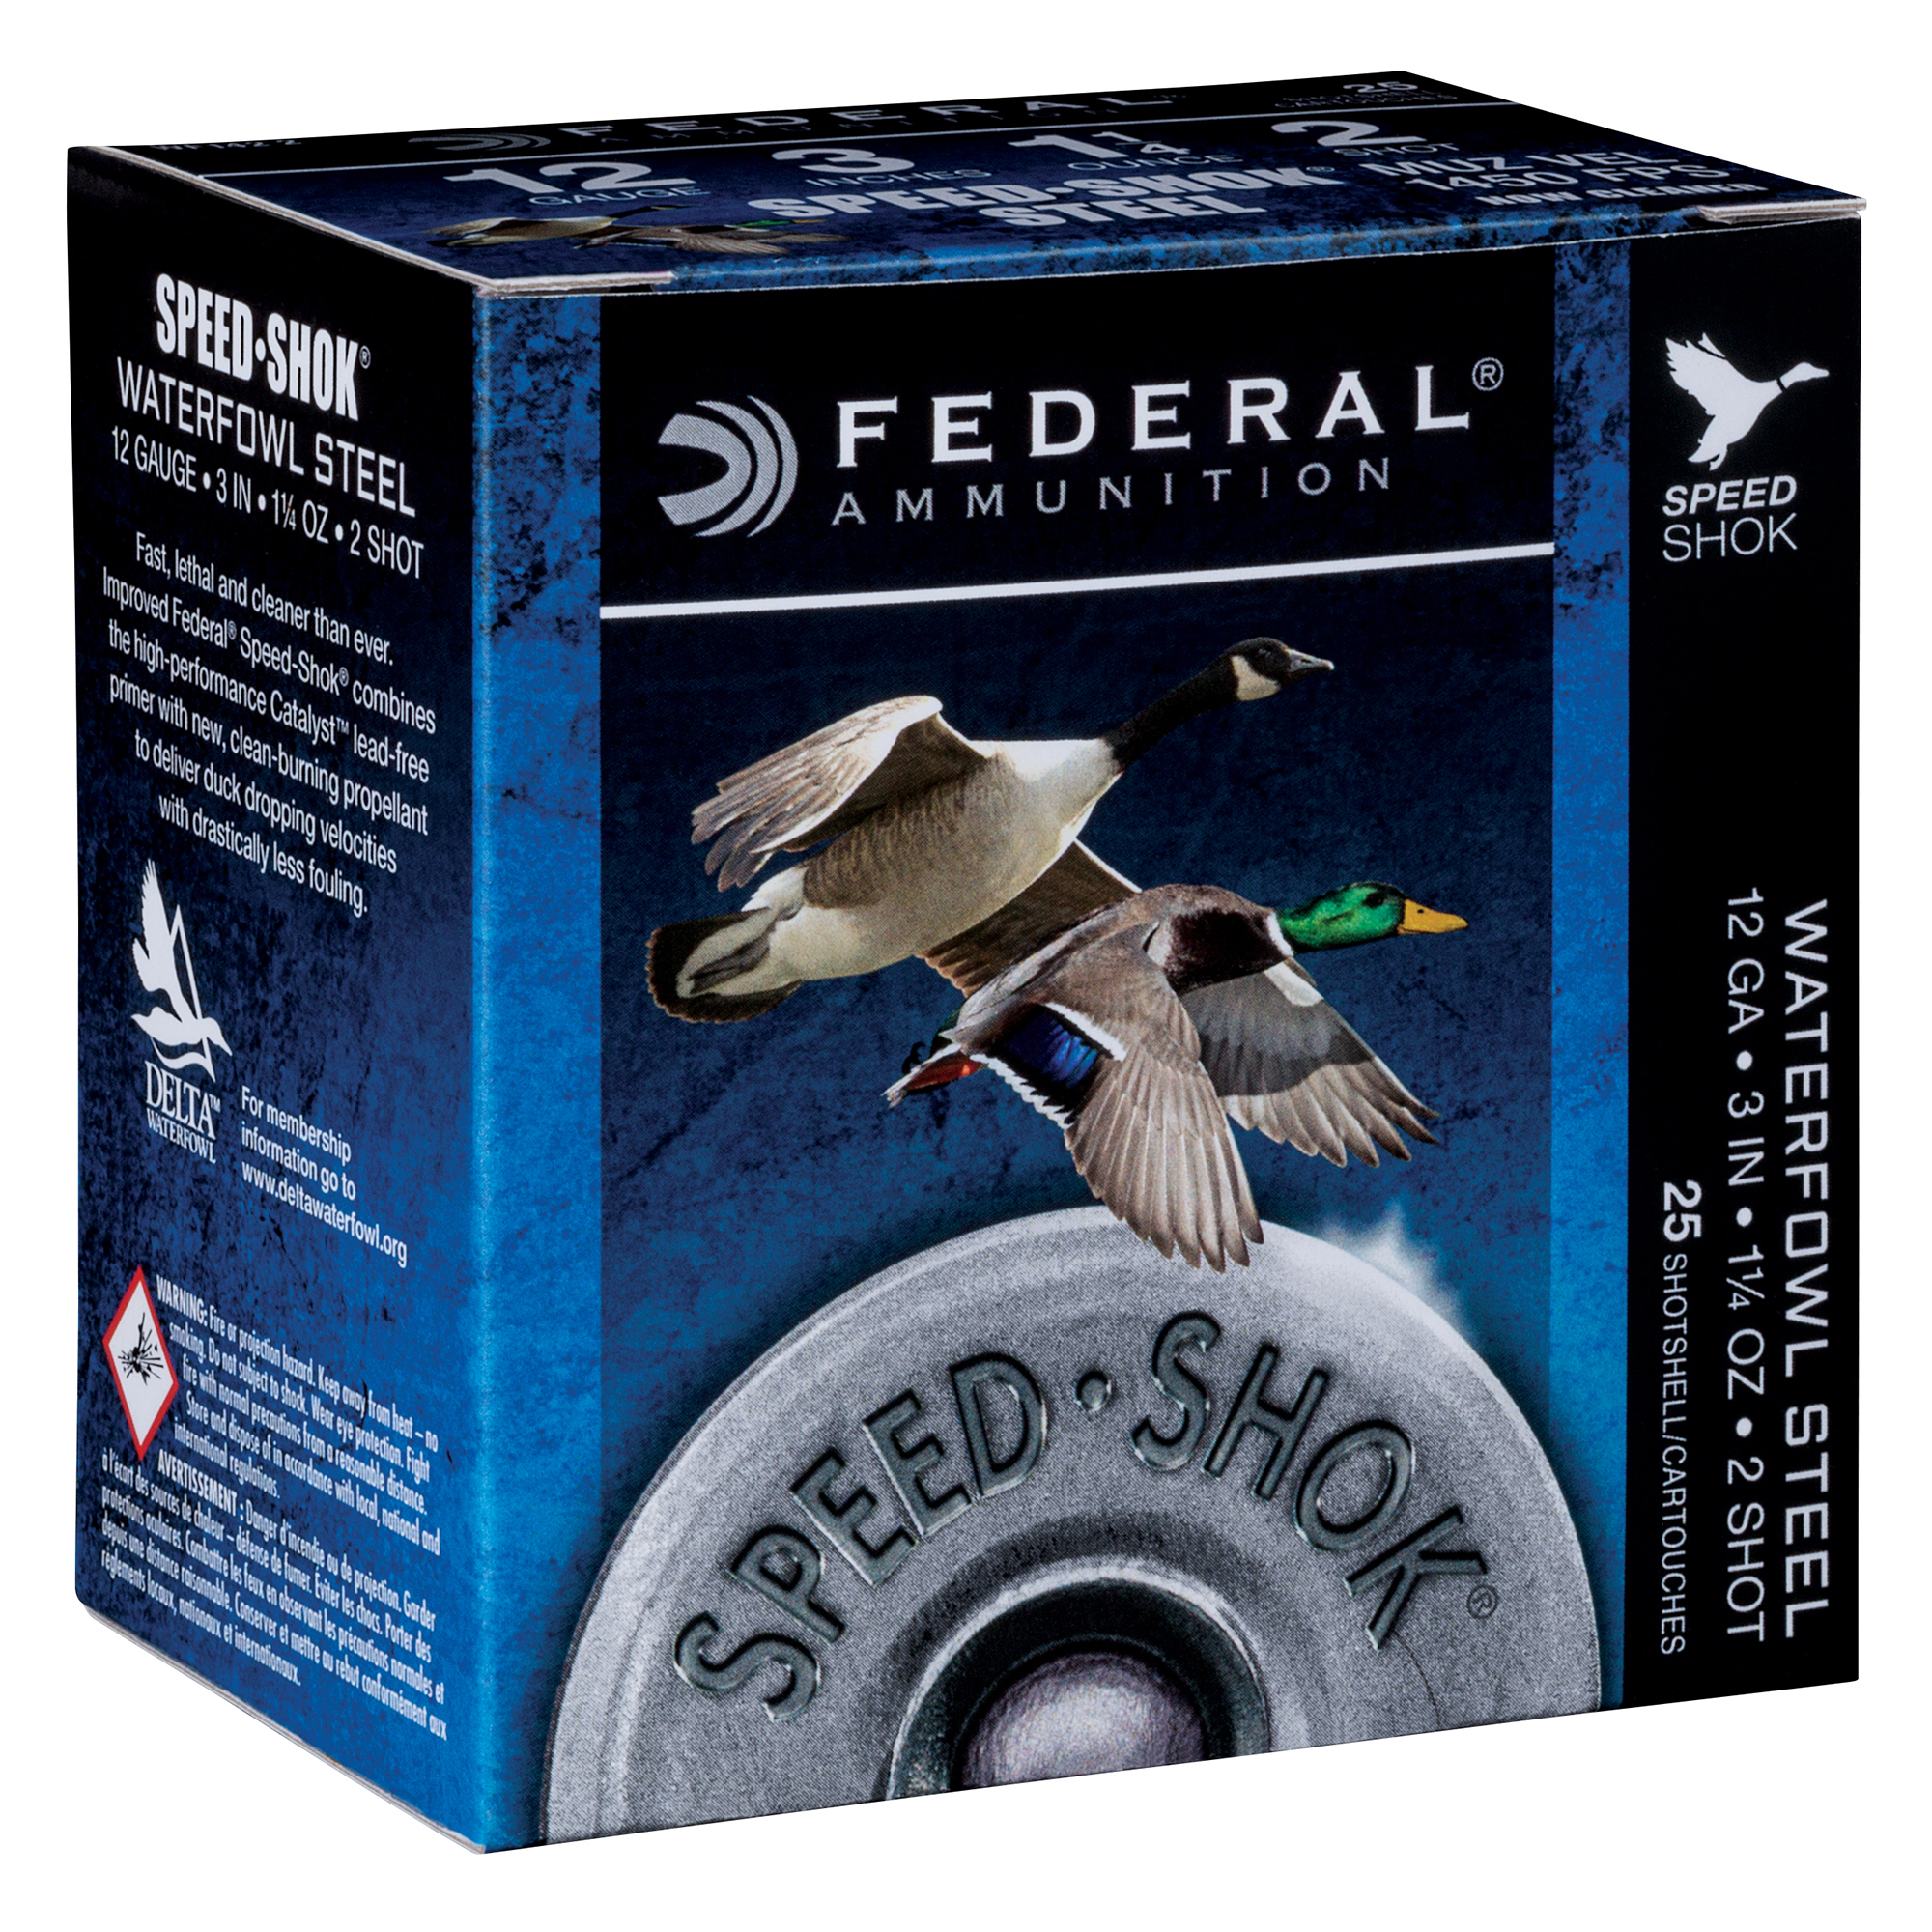 Federal Premium Speed-Shok Steel Waterfowl Loads, 12-ga, 3″, 1-1/4 oz, BB